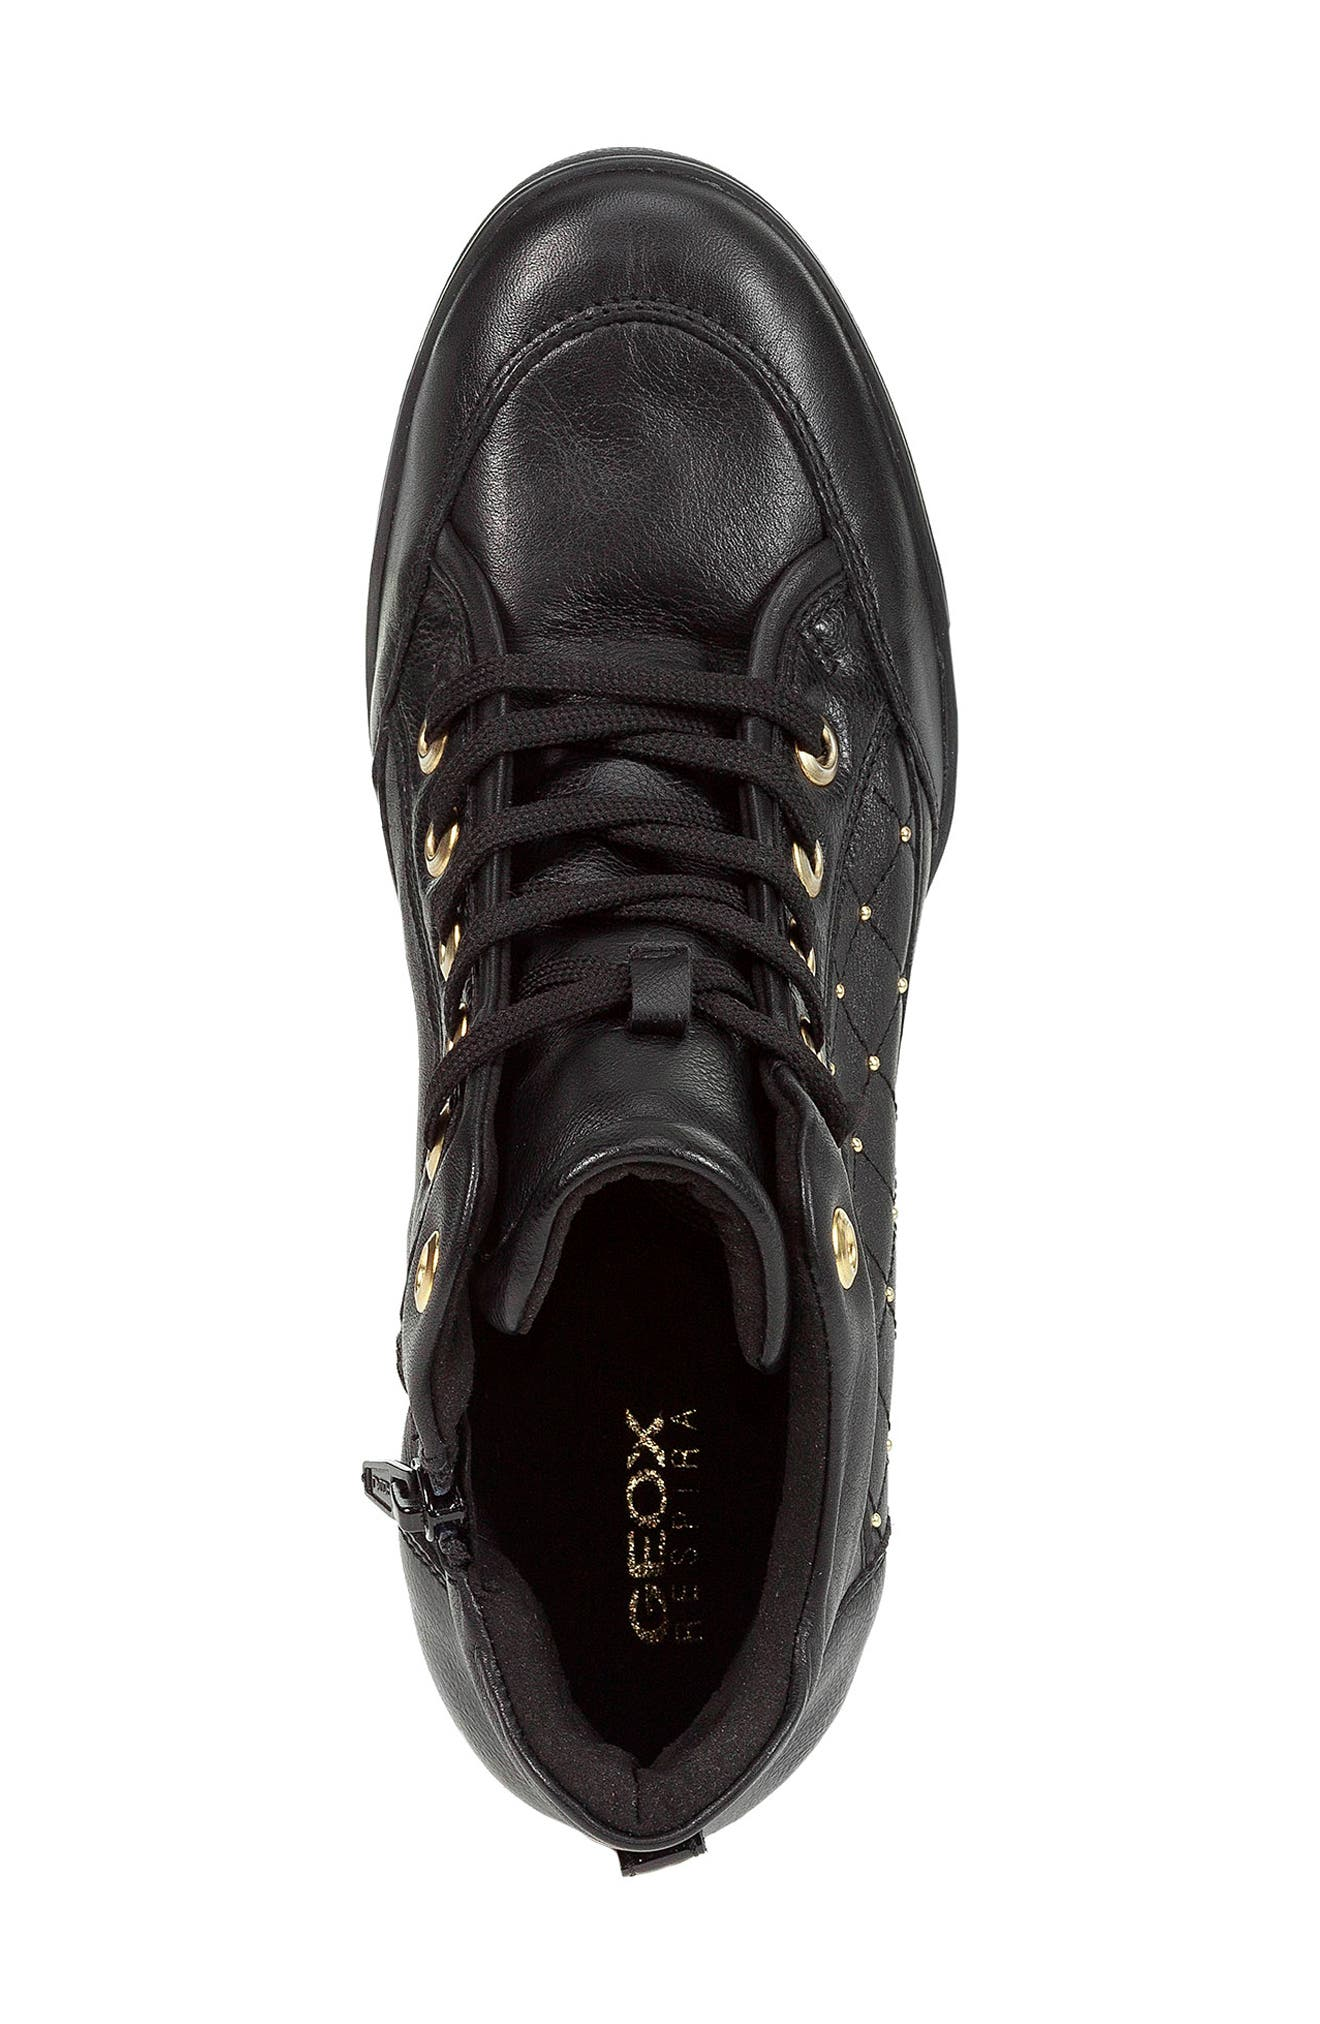 GEOX, Carum Wedge Sneaker, Alternate thumbnail 4, color, 001